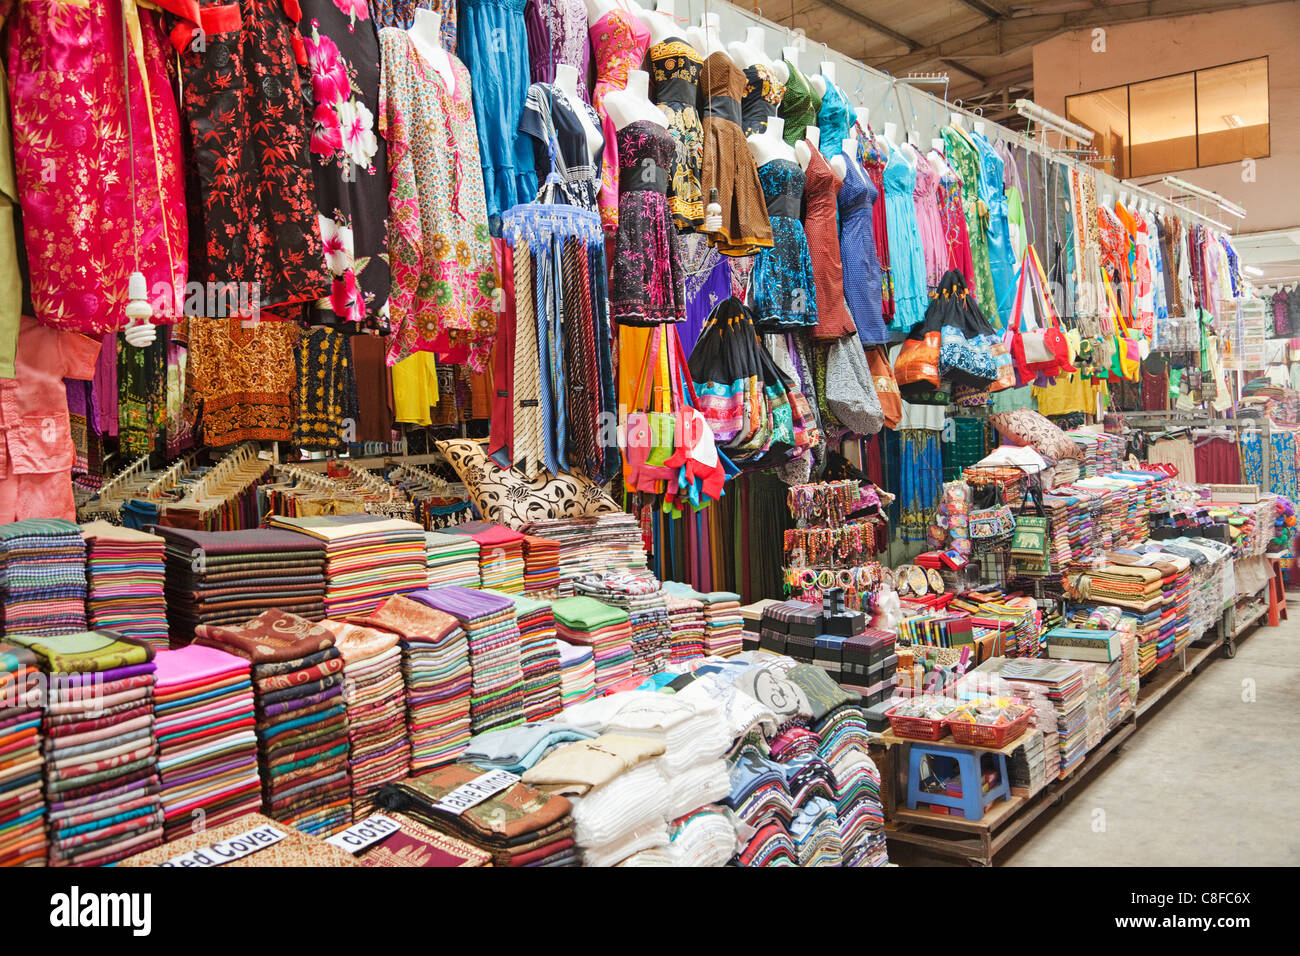 Asia Cambodia Siem Reap Material Fabrics Market Markets Shops